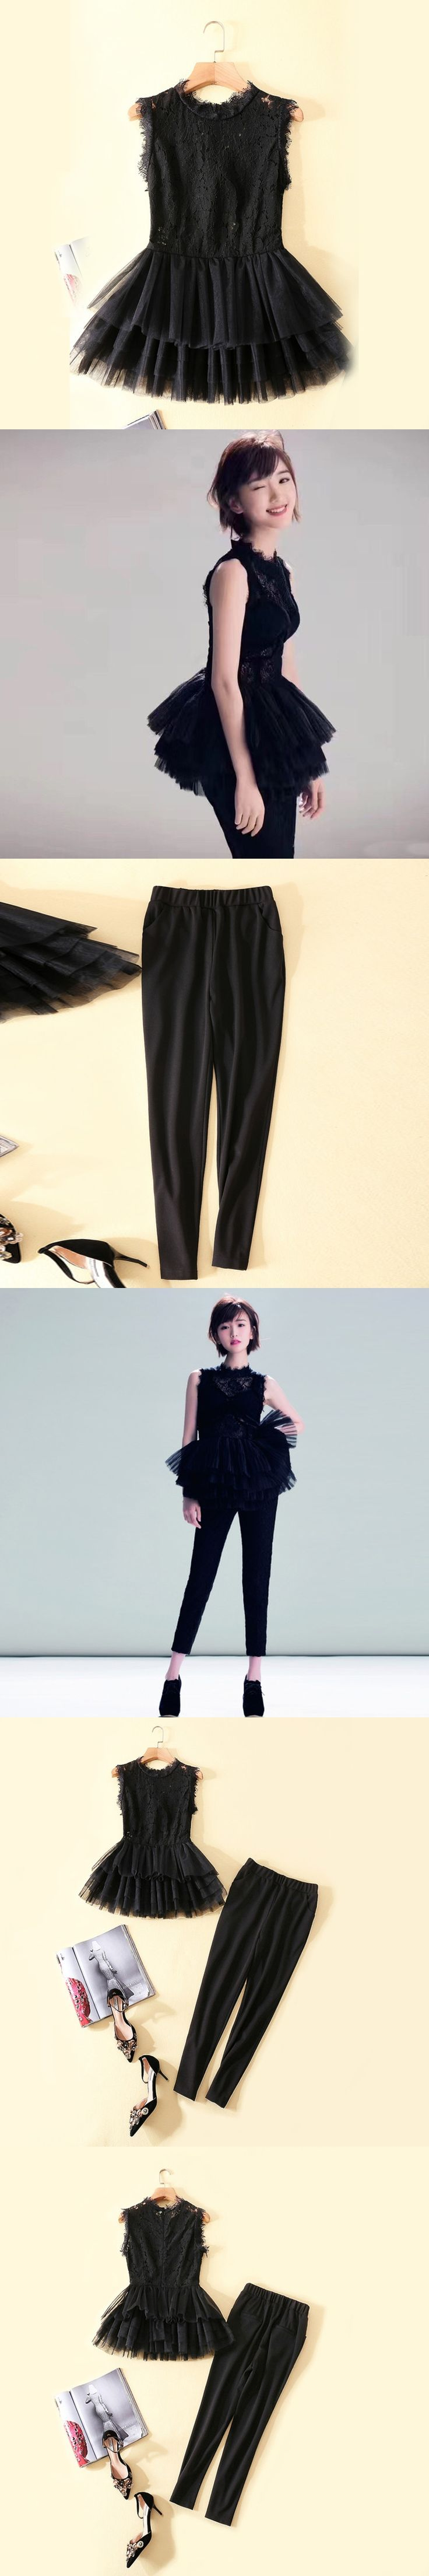 The pendulum fall 2017 new dress lace stitching pressure plait flebean coat+black slim straight trousers